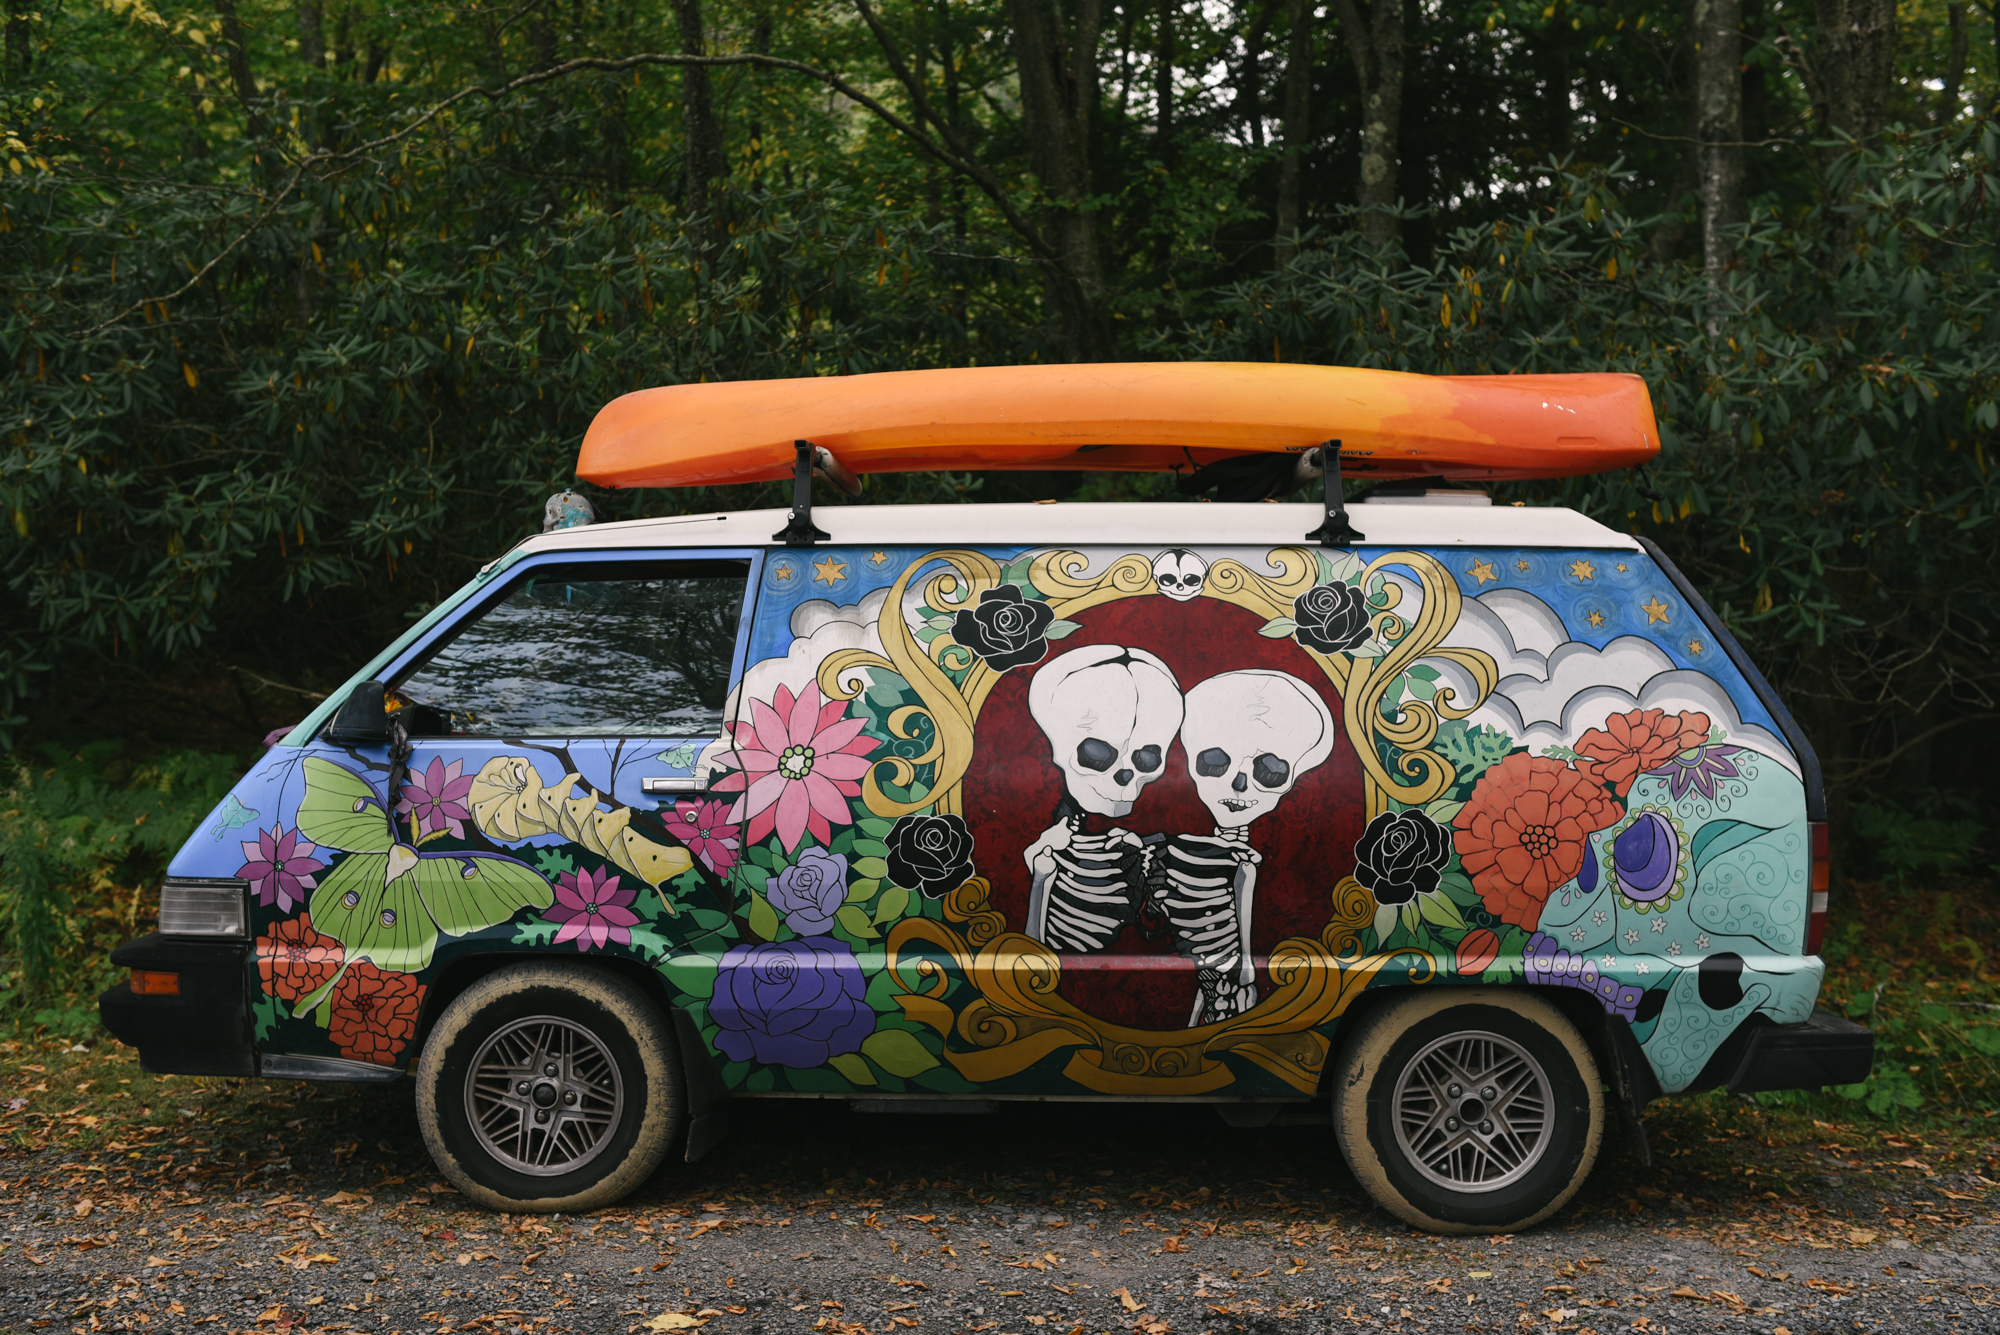 Mountain Wedding, Outdoors, Rustic, West Virginia, Maryland Wedding Photographer, DIY, Casual, Colorful painted van, painting of skeletons on van